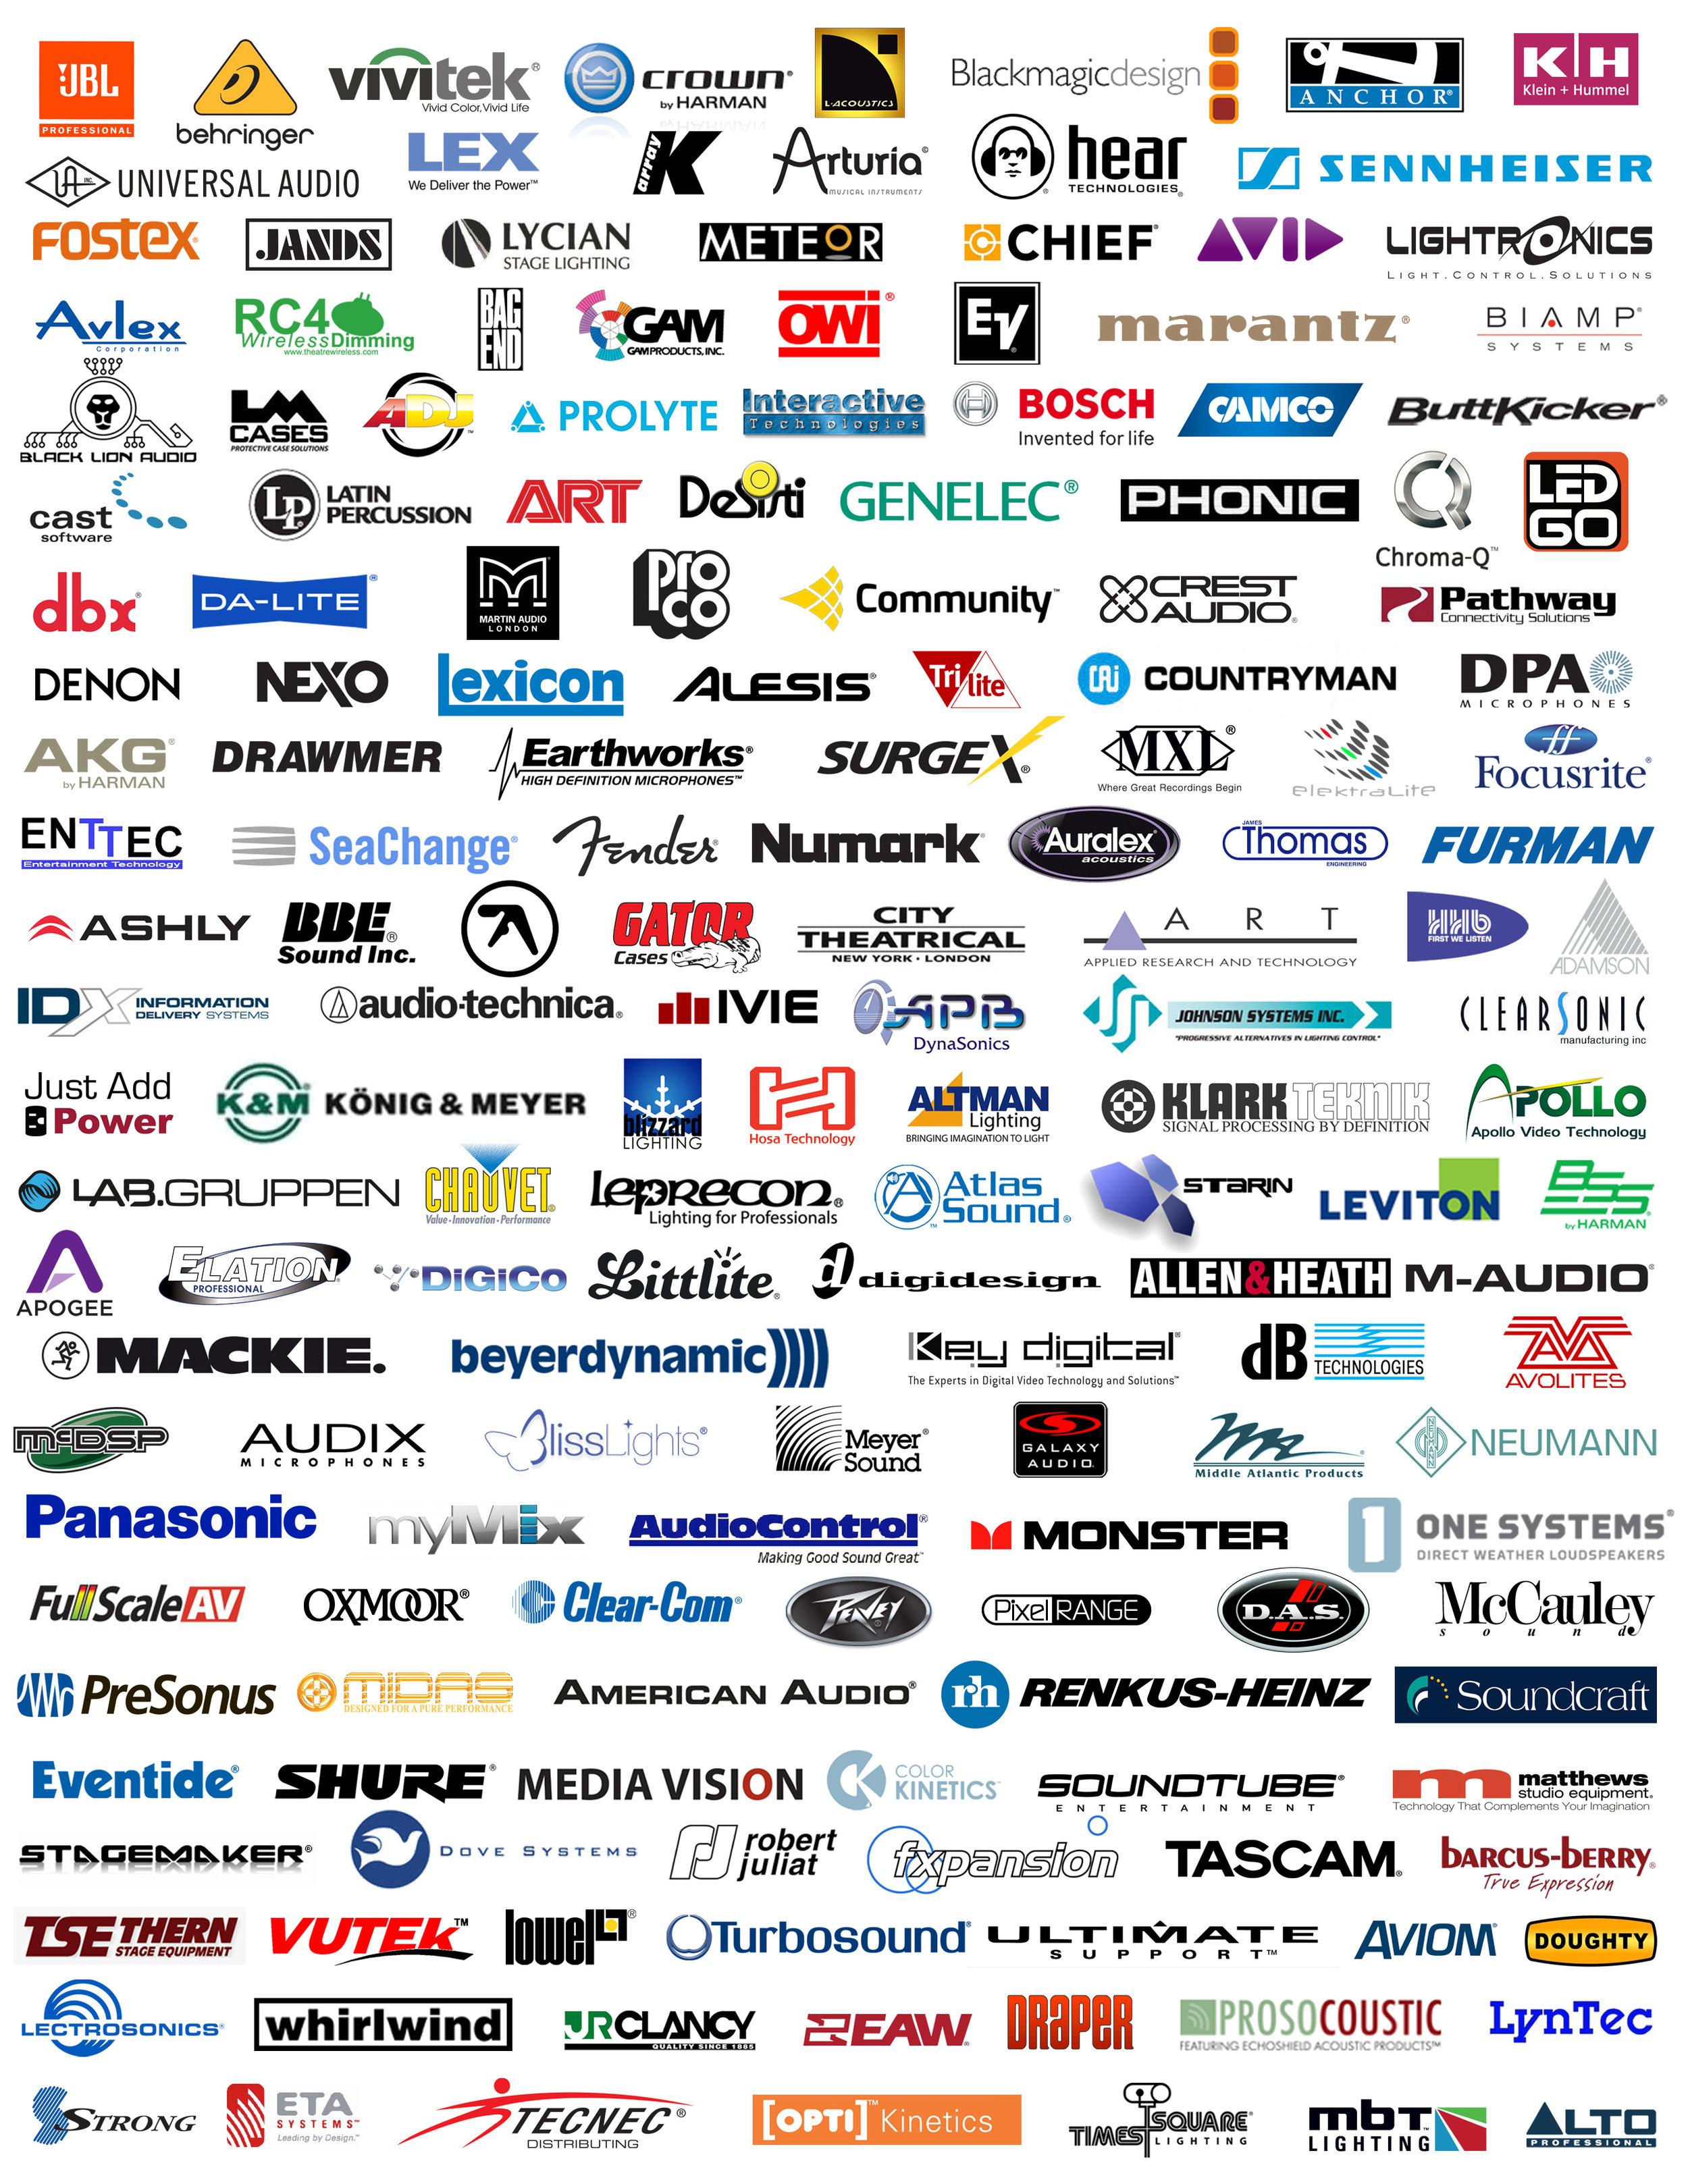 LiveSpace_Vender Logos.jpg